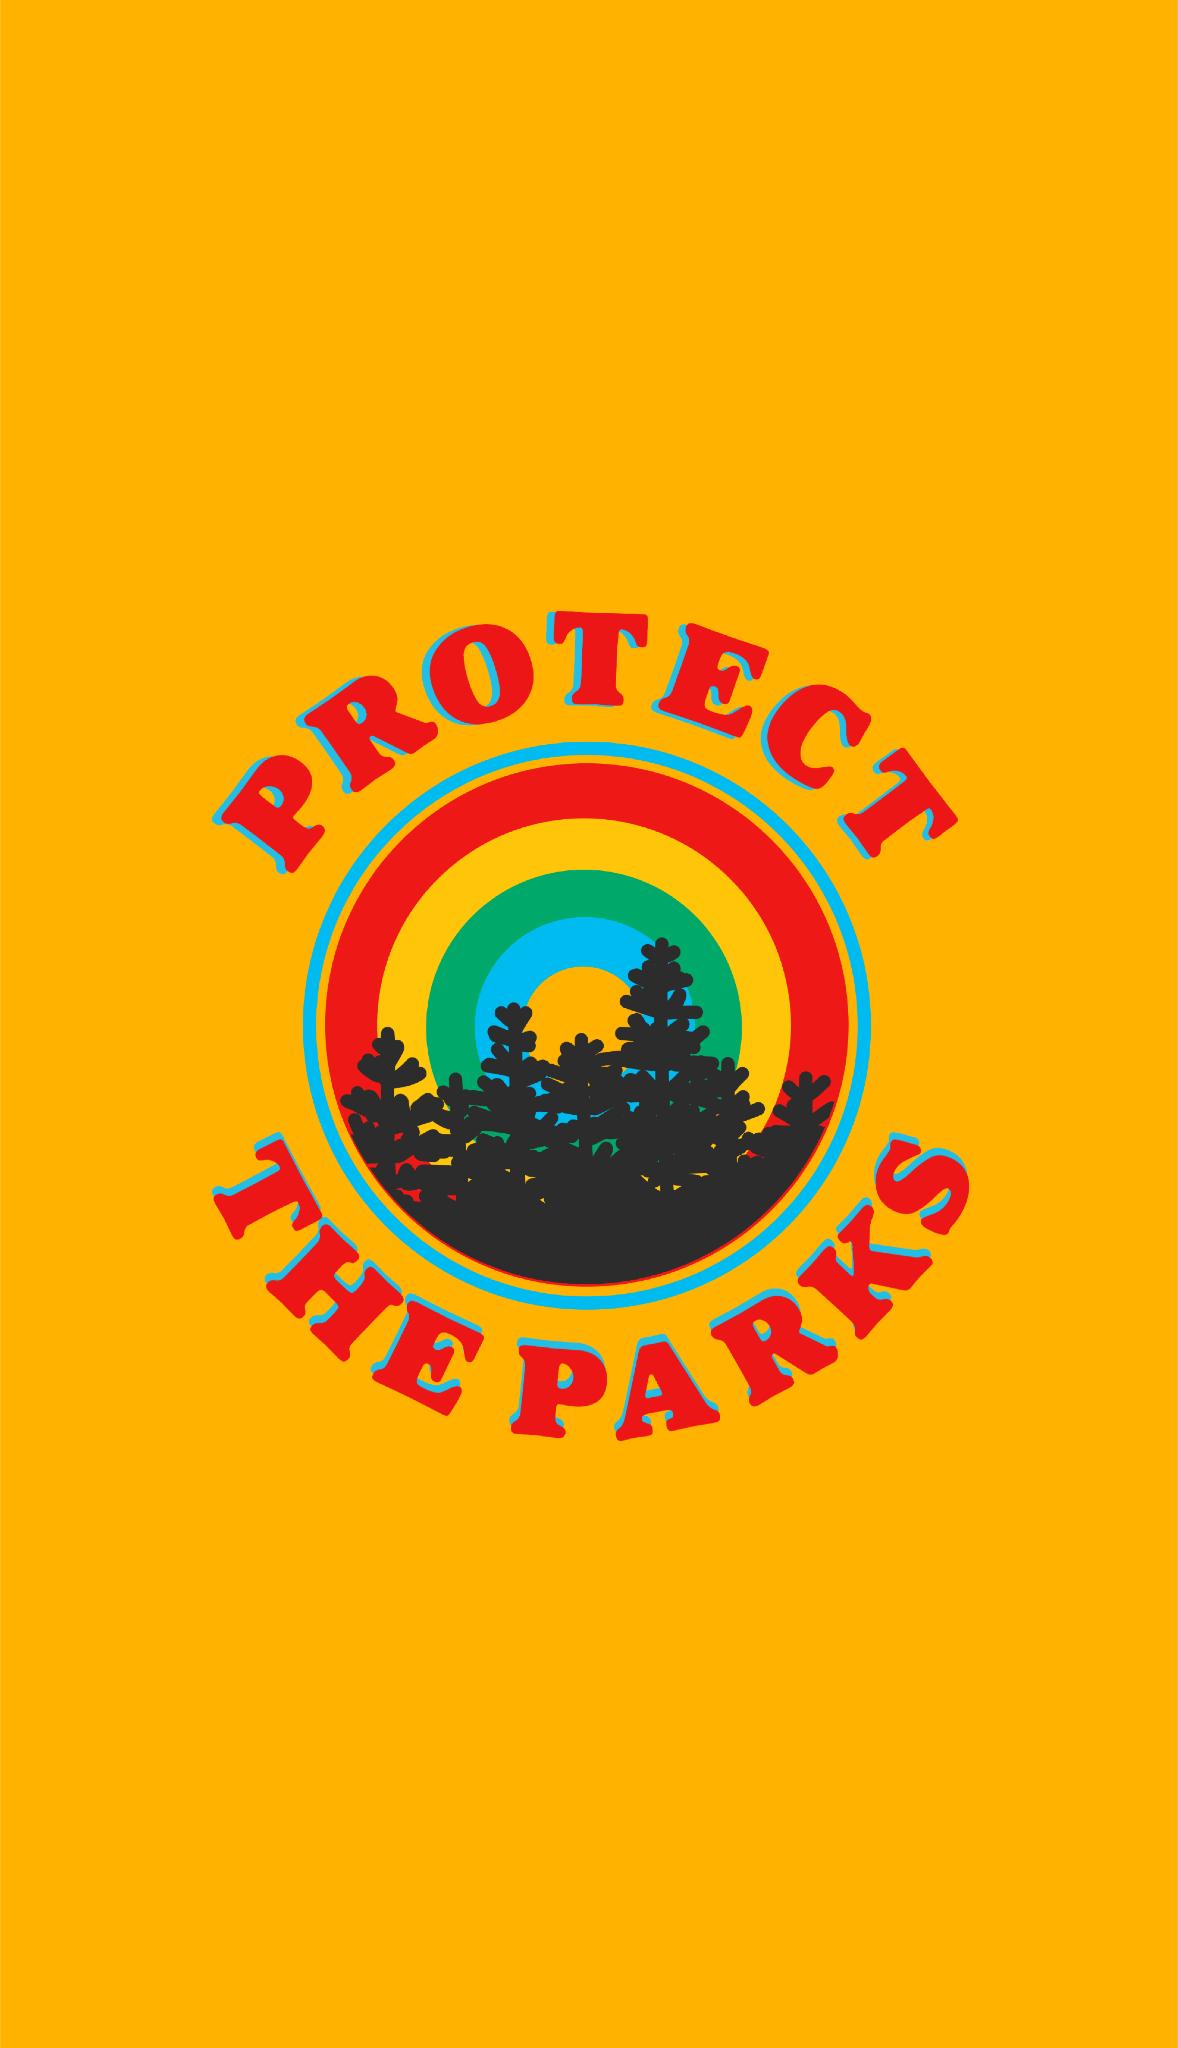 Protect The Parks Retro Aesthetic Environmentalist Sticker Sticker By Lexie Pitzen Retro Aesthetic Nature Design Yellow Aesthetic